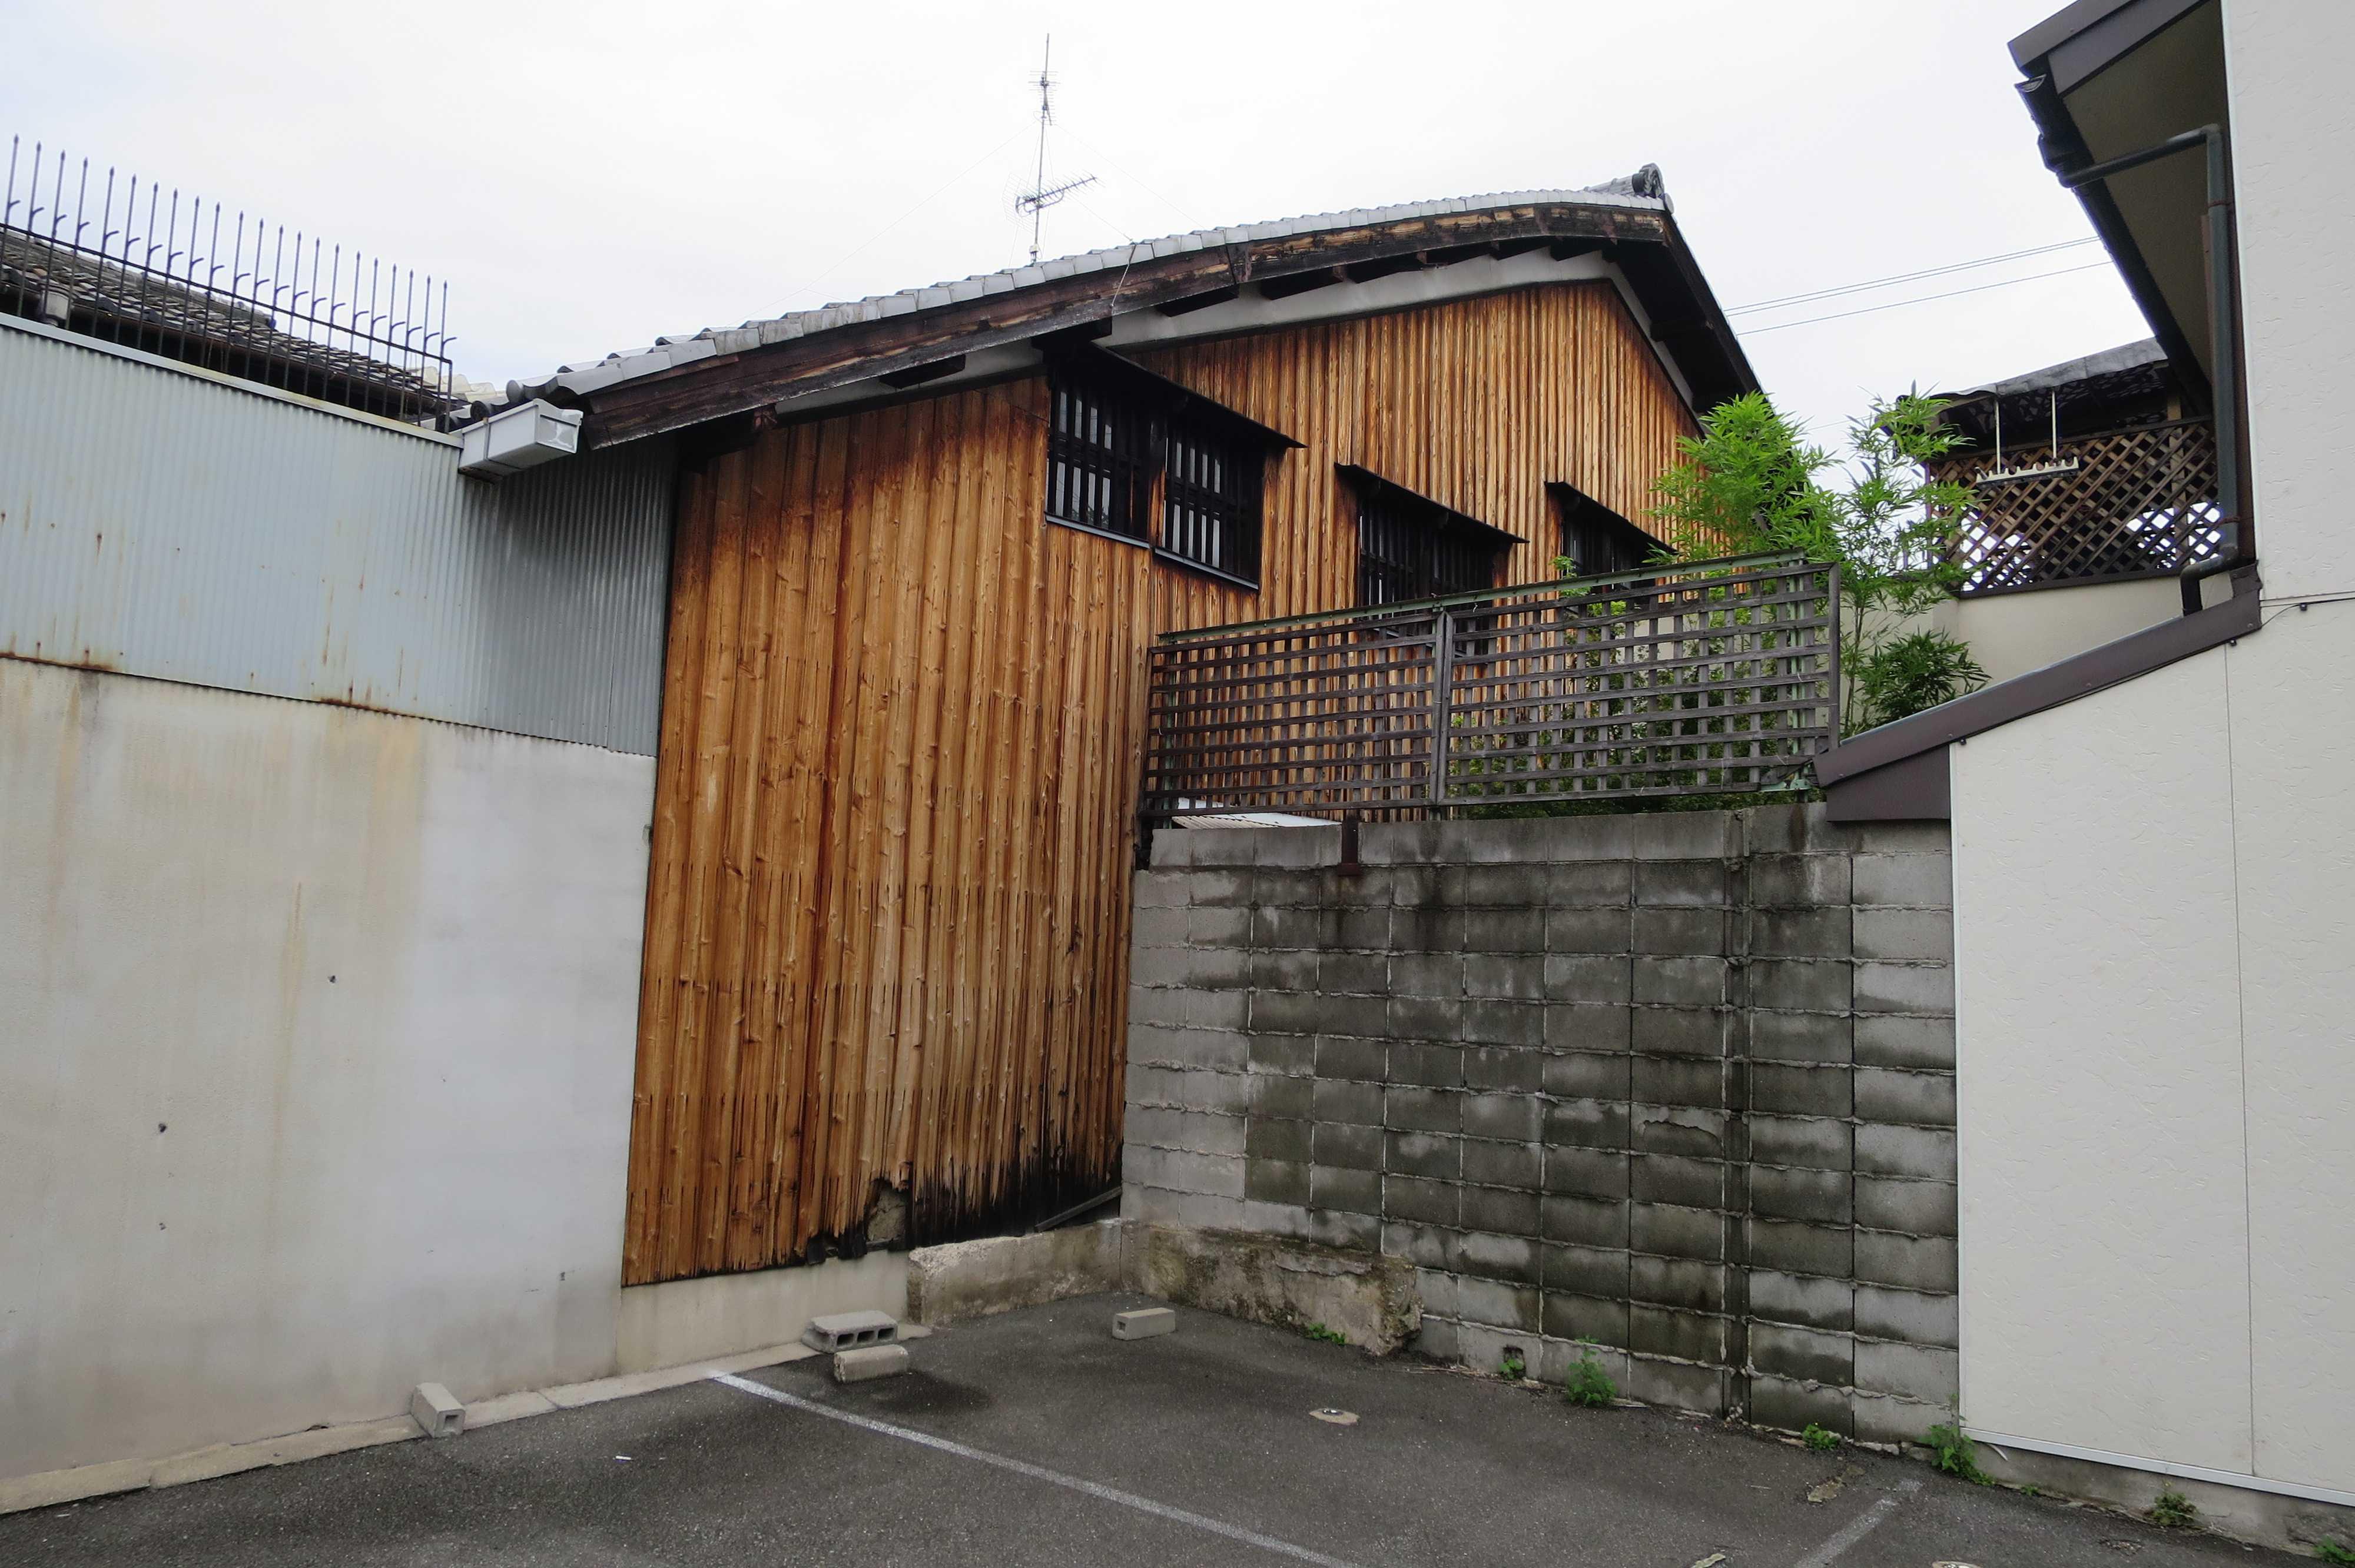 京都 - 板壁の家